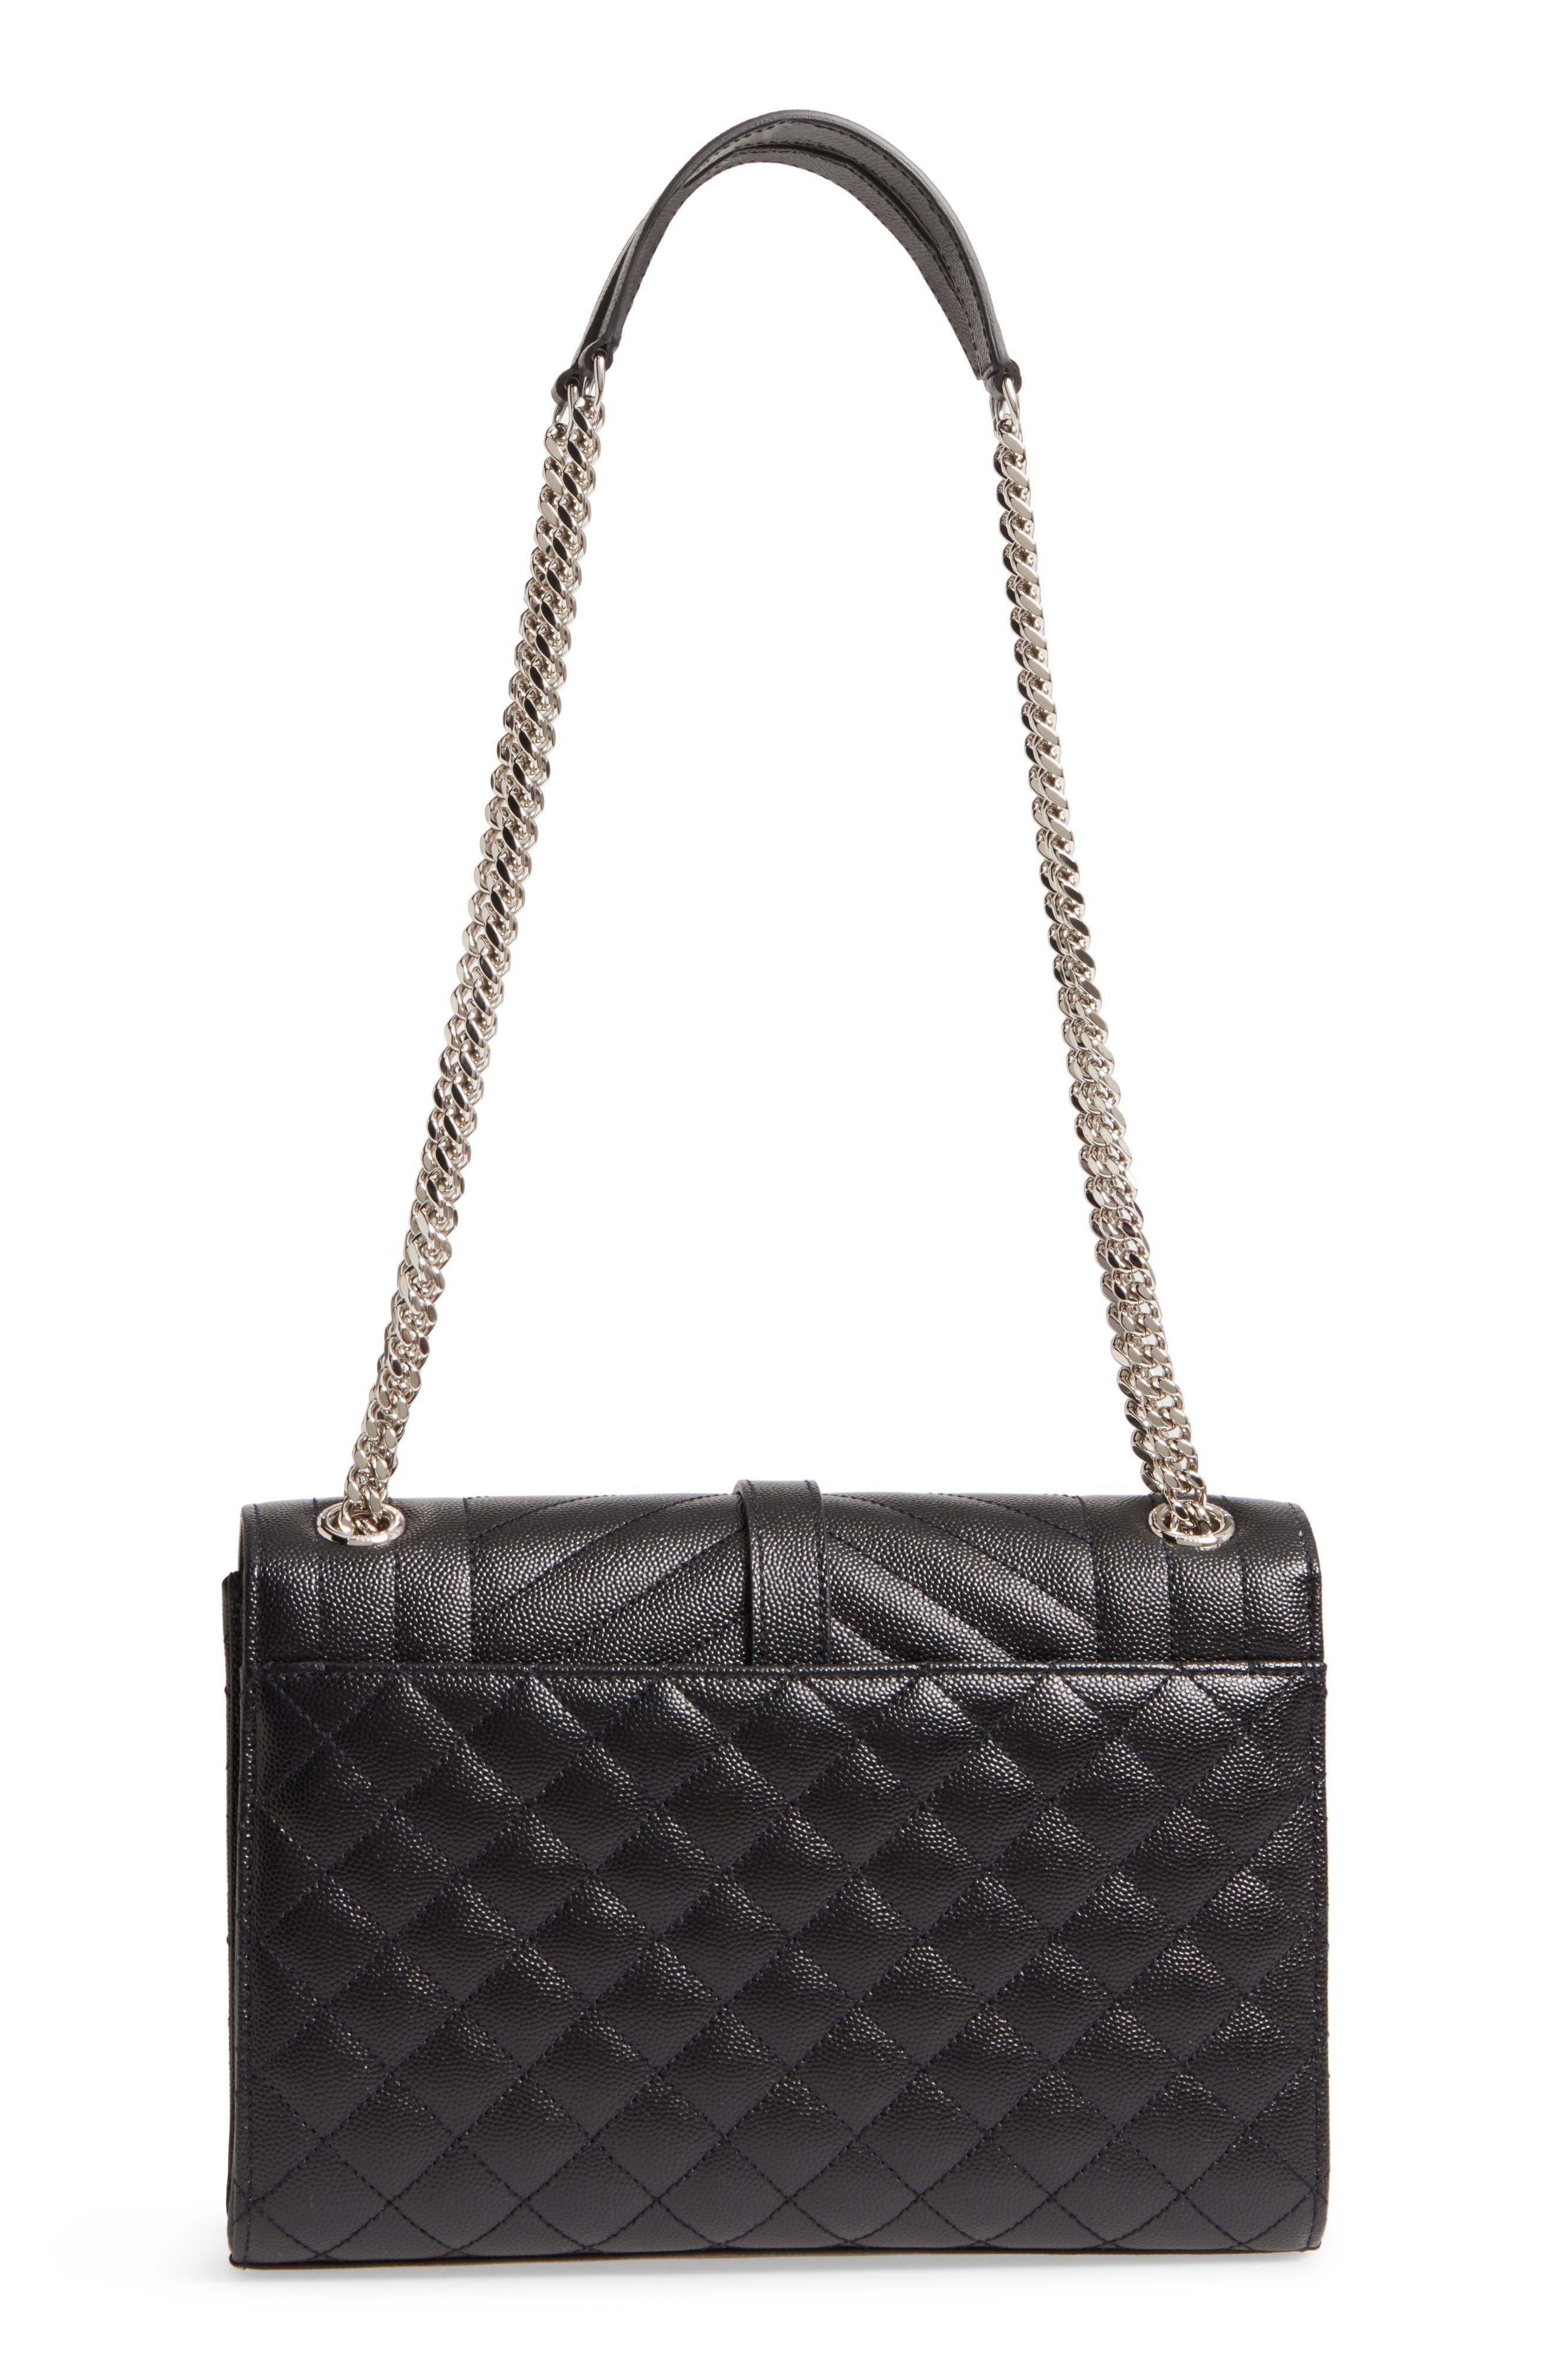 Medium Cassandra Calfskin Shoulder Bag,                             Alternate thumbnail 3, color,                             001